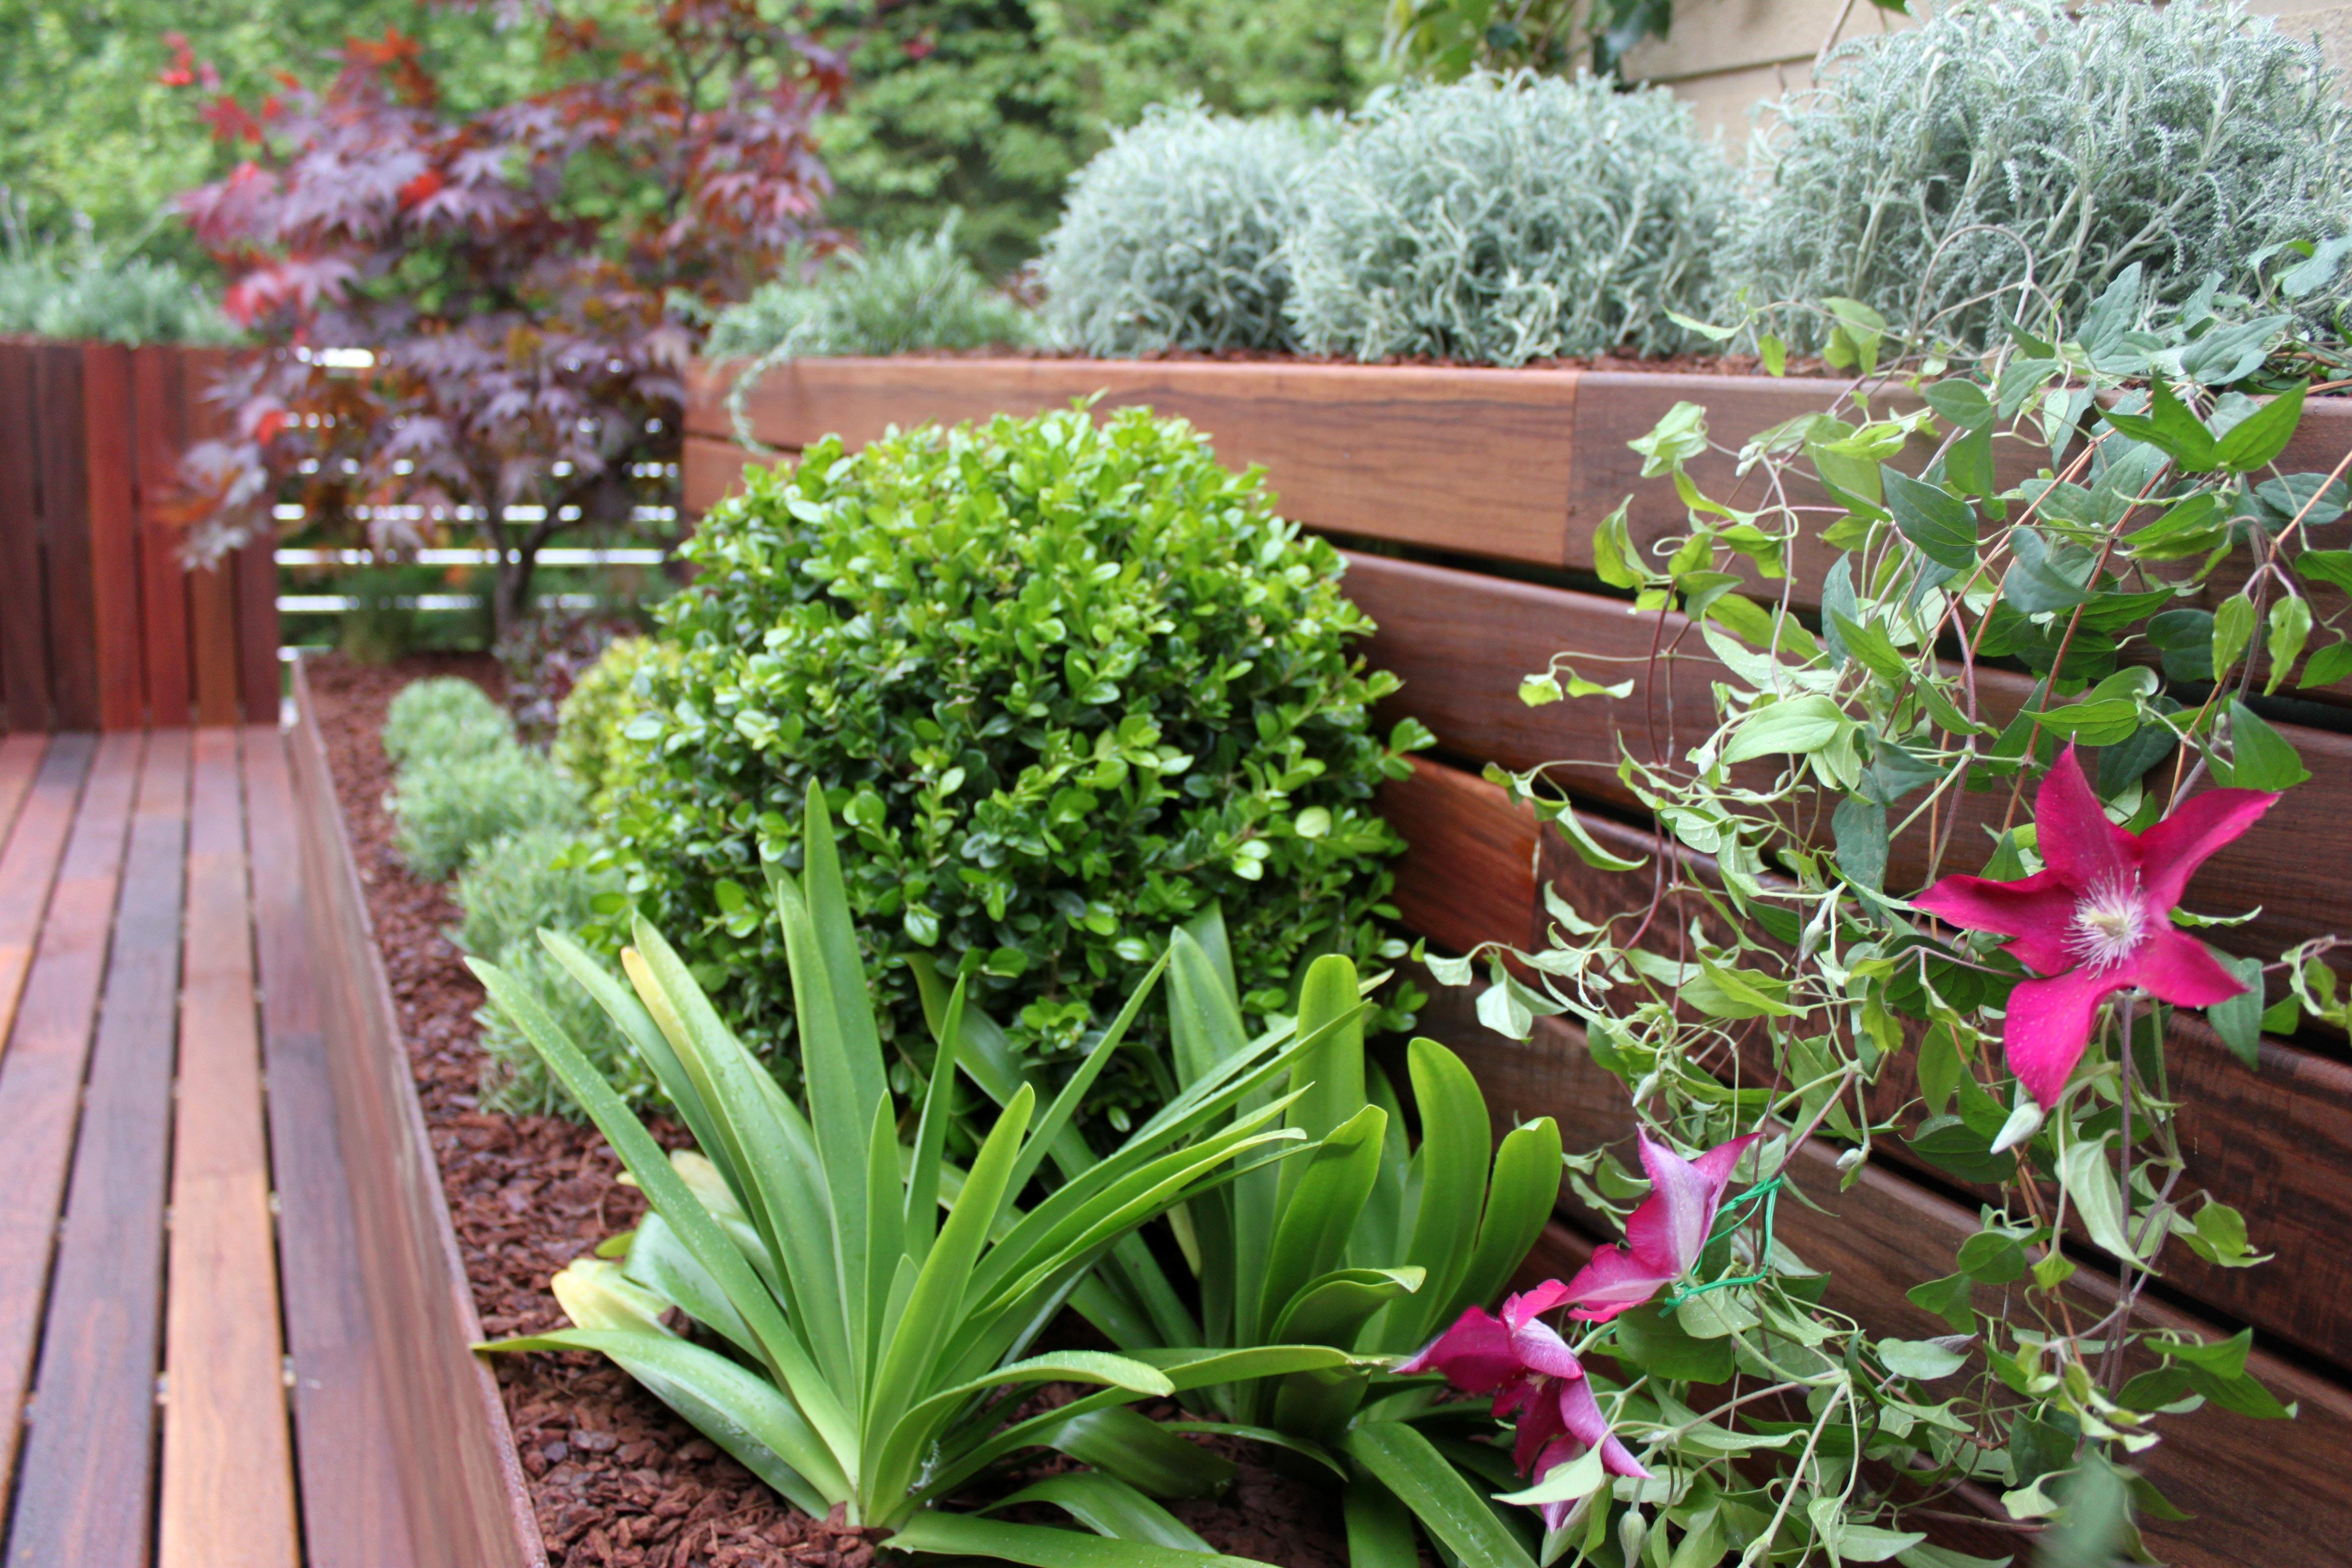 Plantas exterior resistentes hiedra with plantas exterior - Plantas resistentes exterior ...